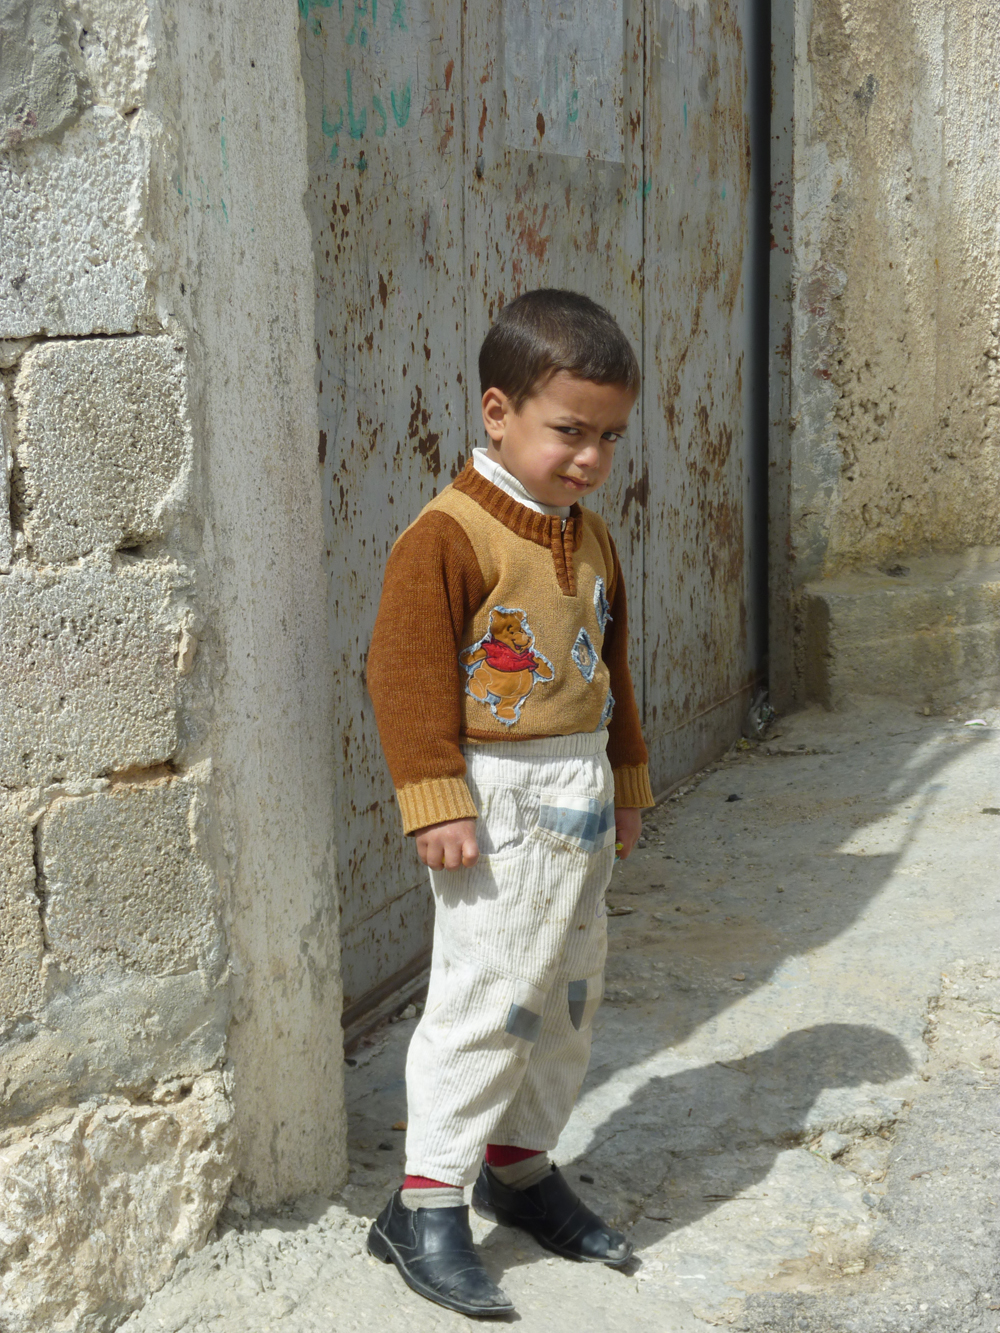 East Jerusalem. Arab Israeli conflict | Olivetreejourney's ...